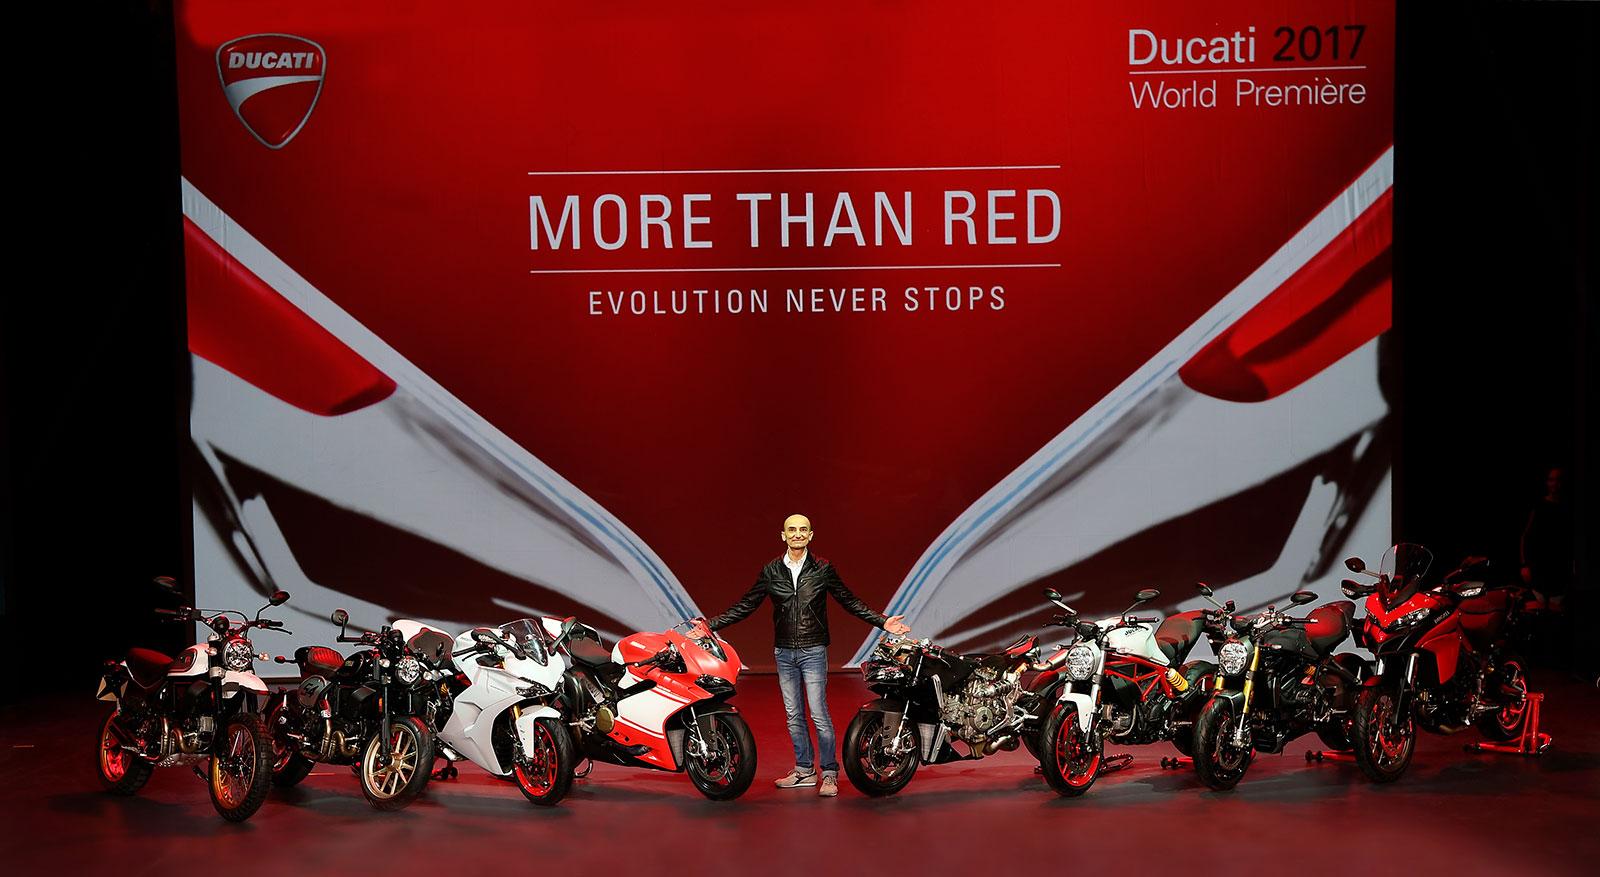 Ducati – World Première